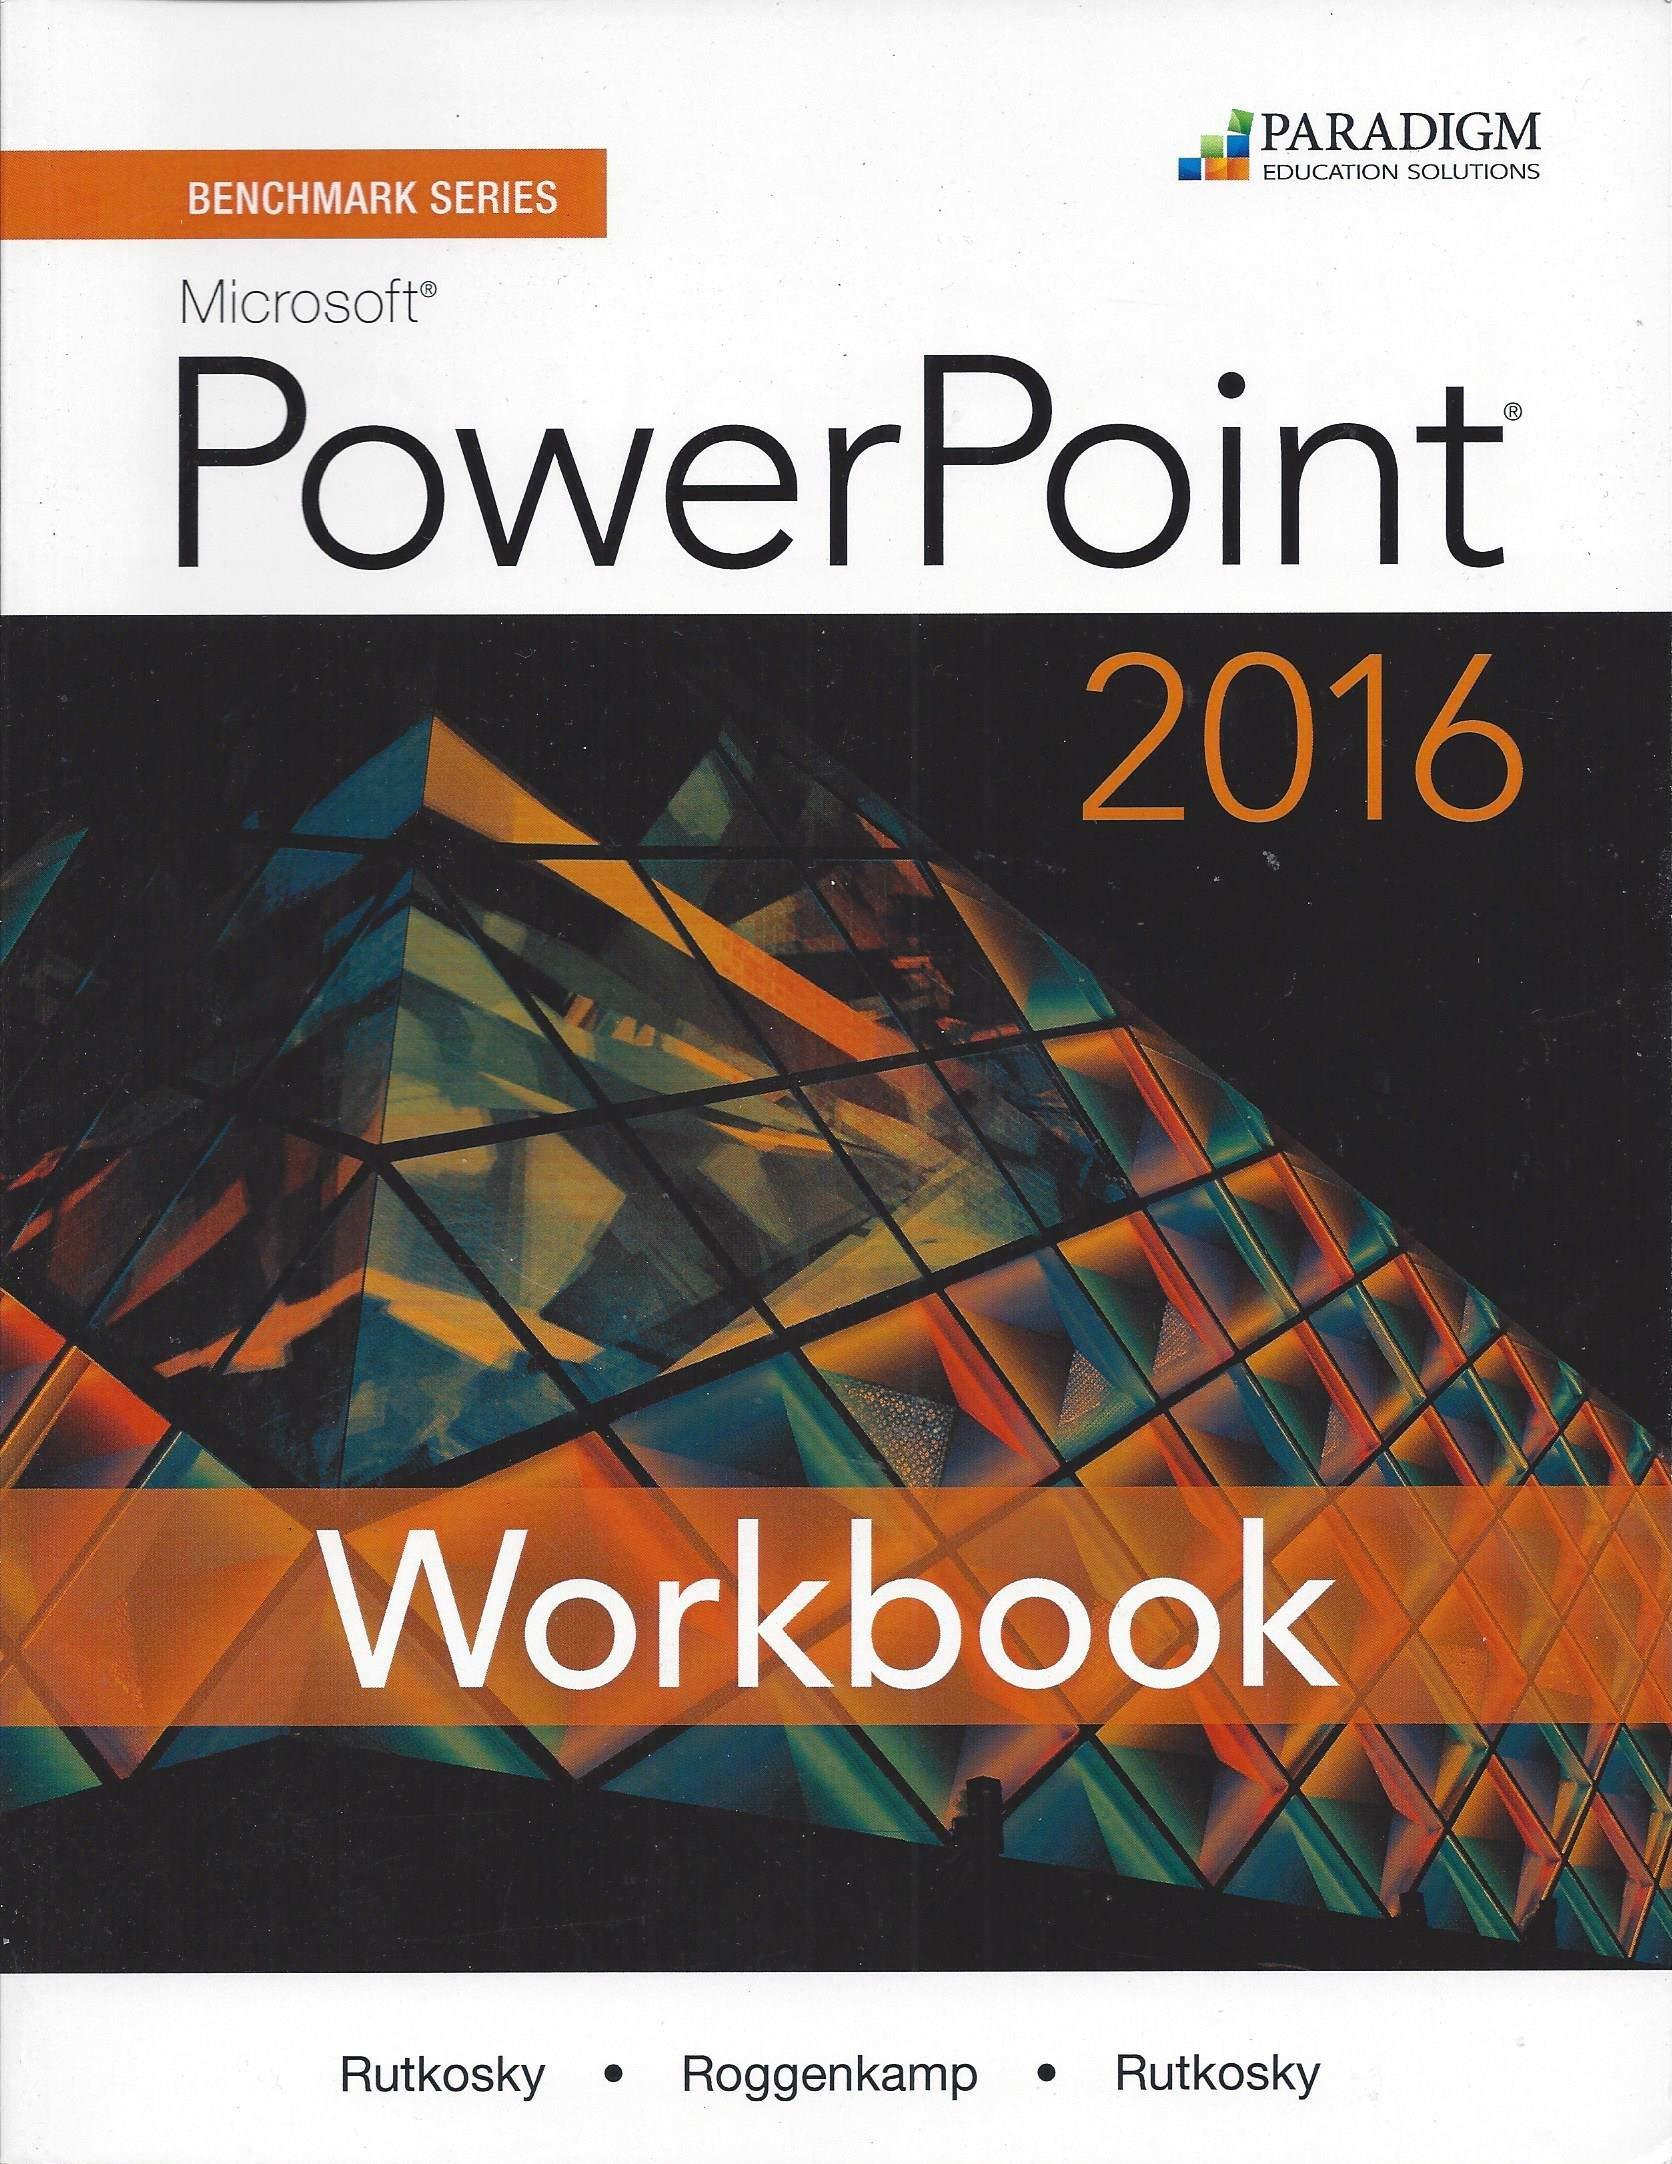 benchmark series microsoft r powerpoint 2016 workbook